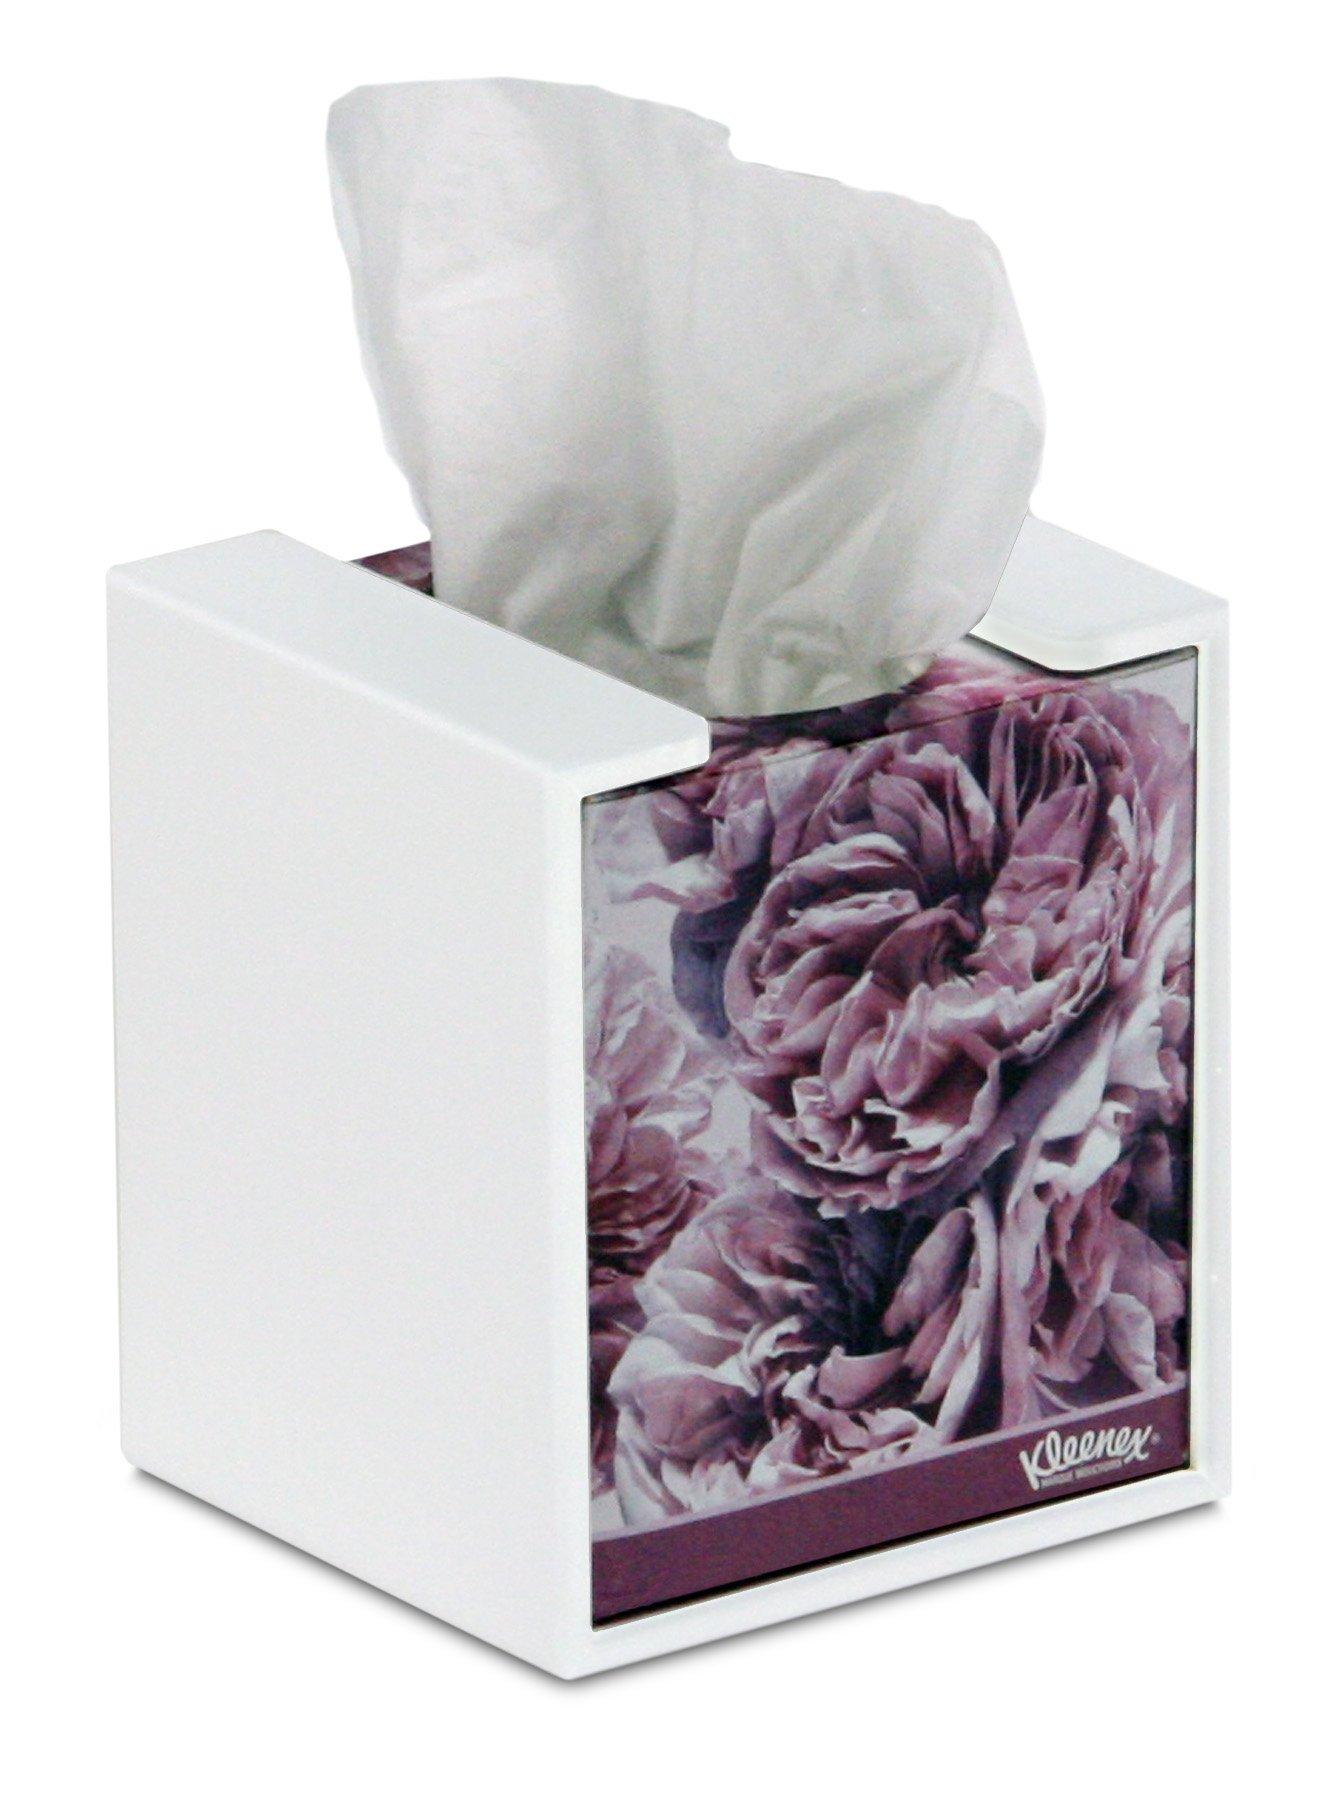 TrippNT 50760 Plastic Wall-Mountable Cube Kleenex Box Holder, 5'' Width x 5'' Height x 5'' Depth